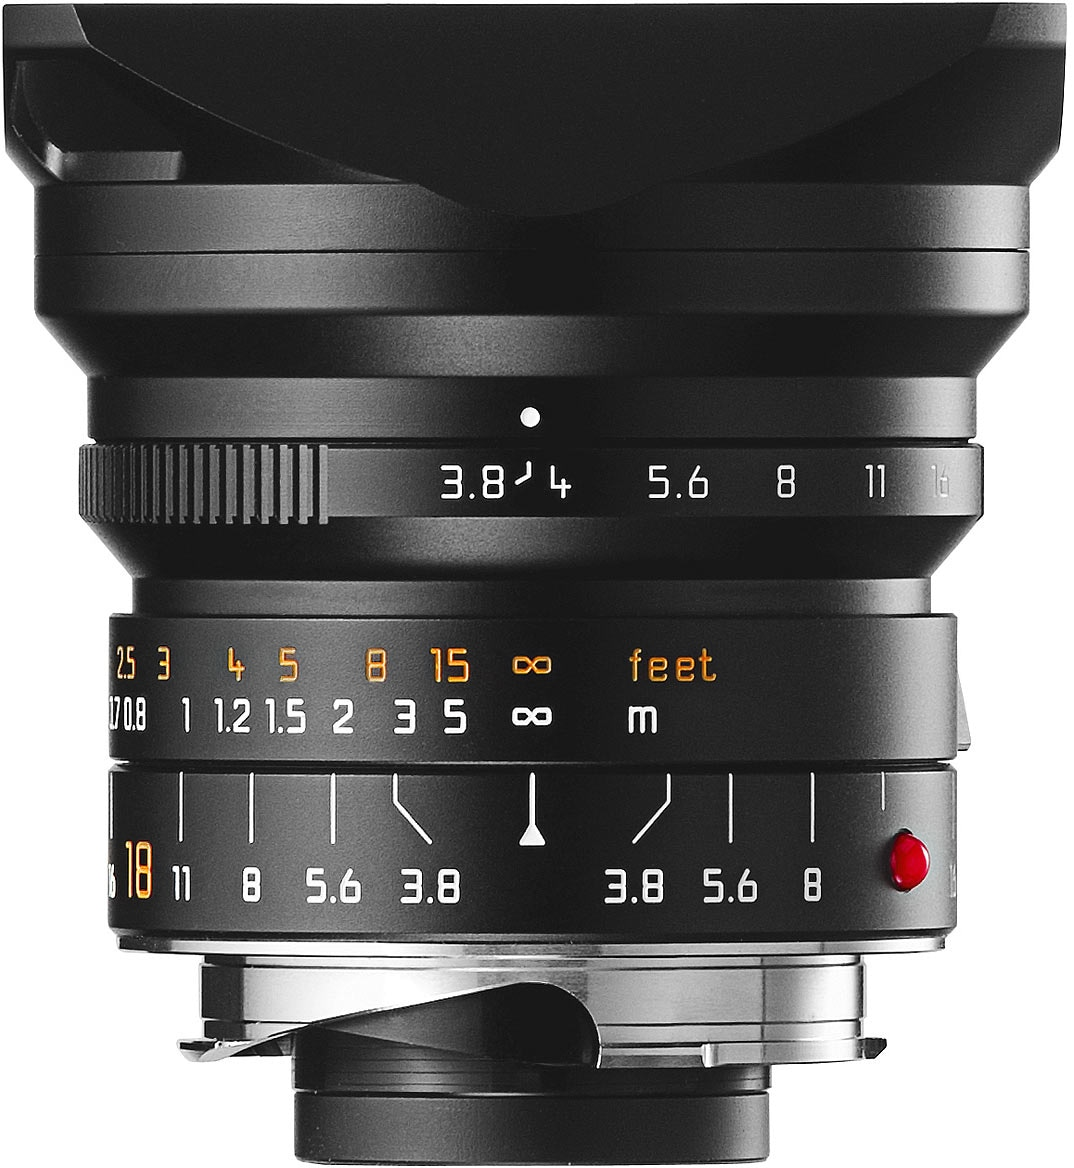 Leica Super Elmar M 18mm f/3,8 ASPH